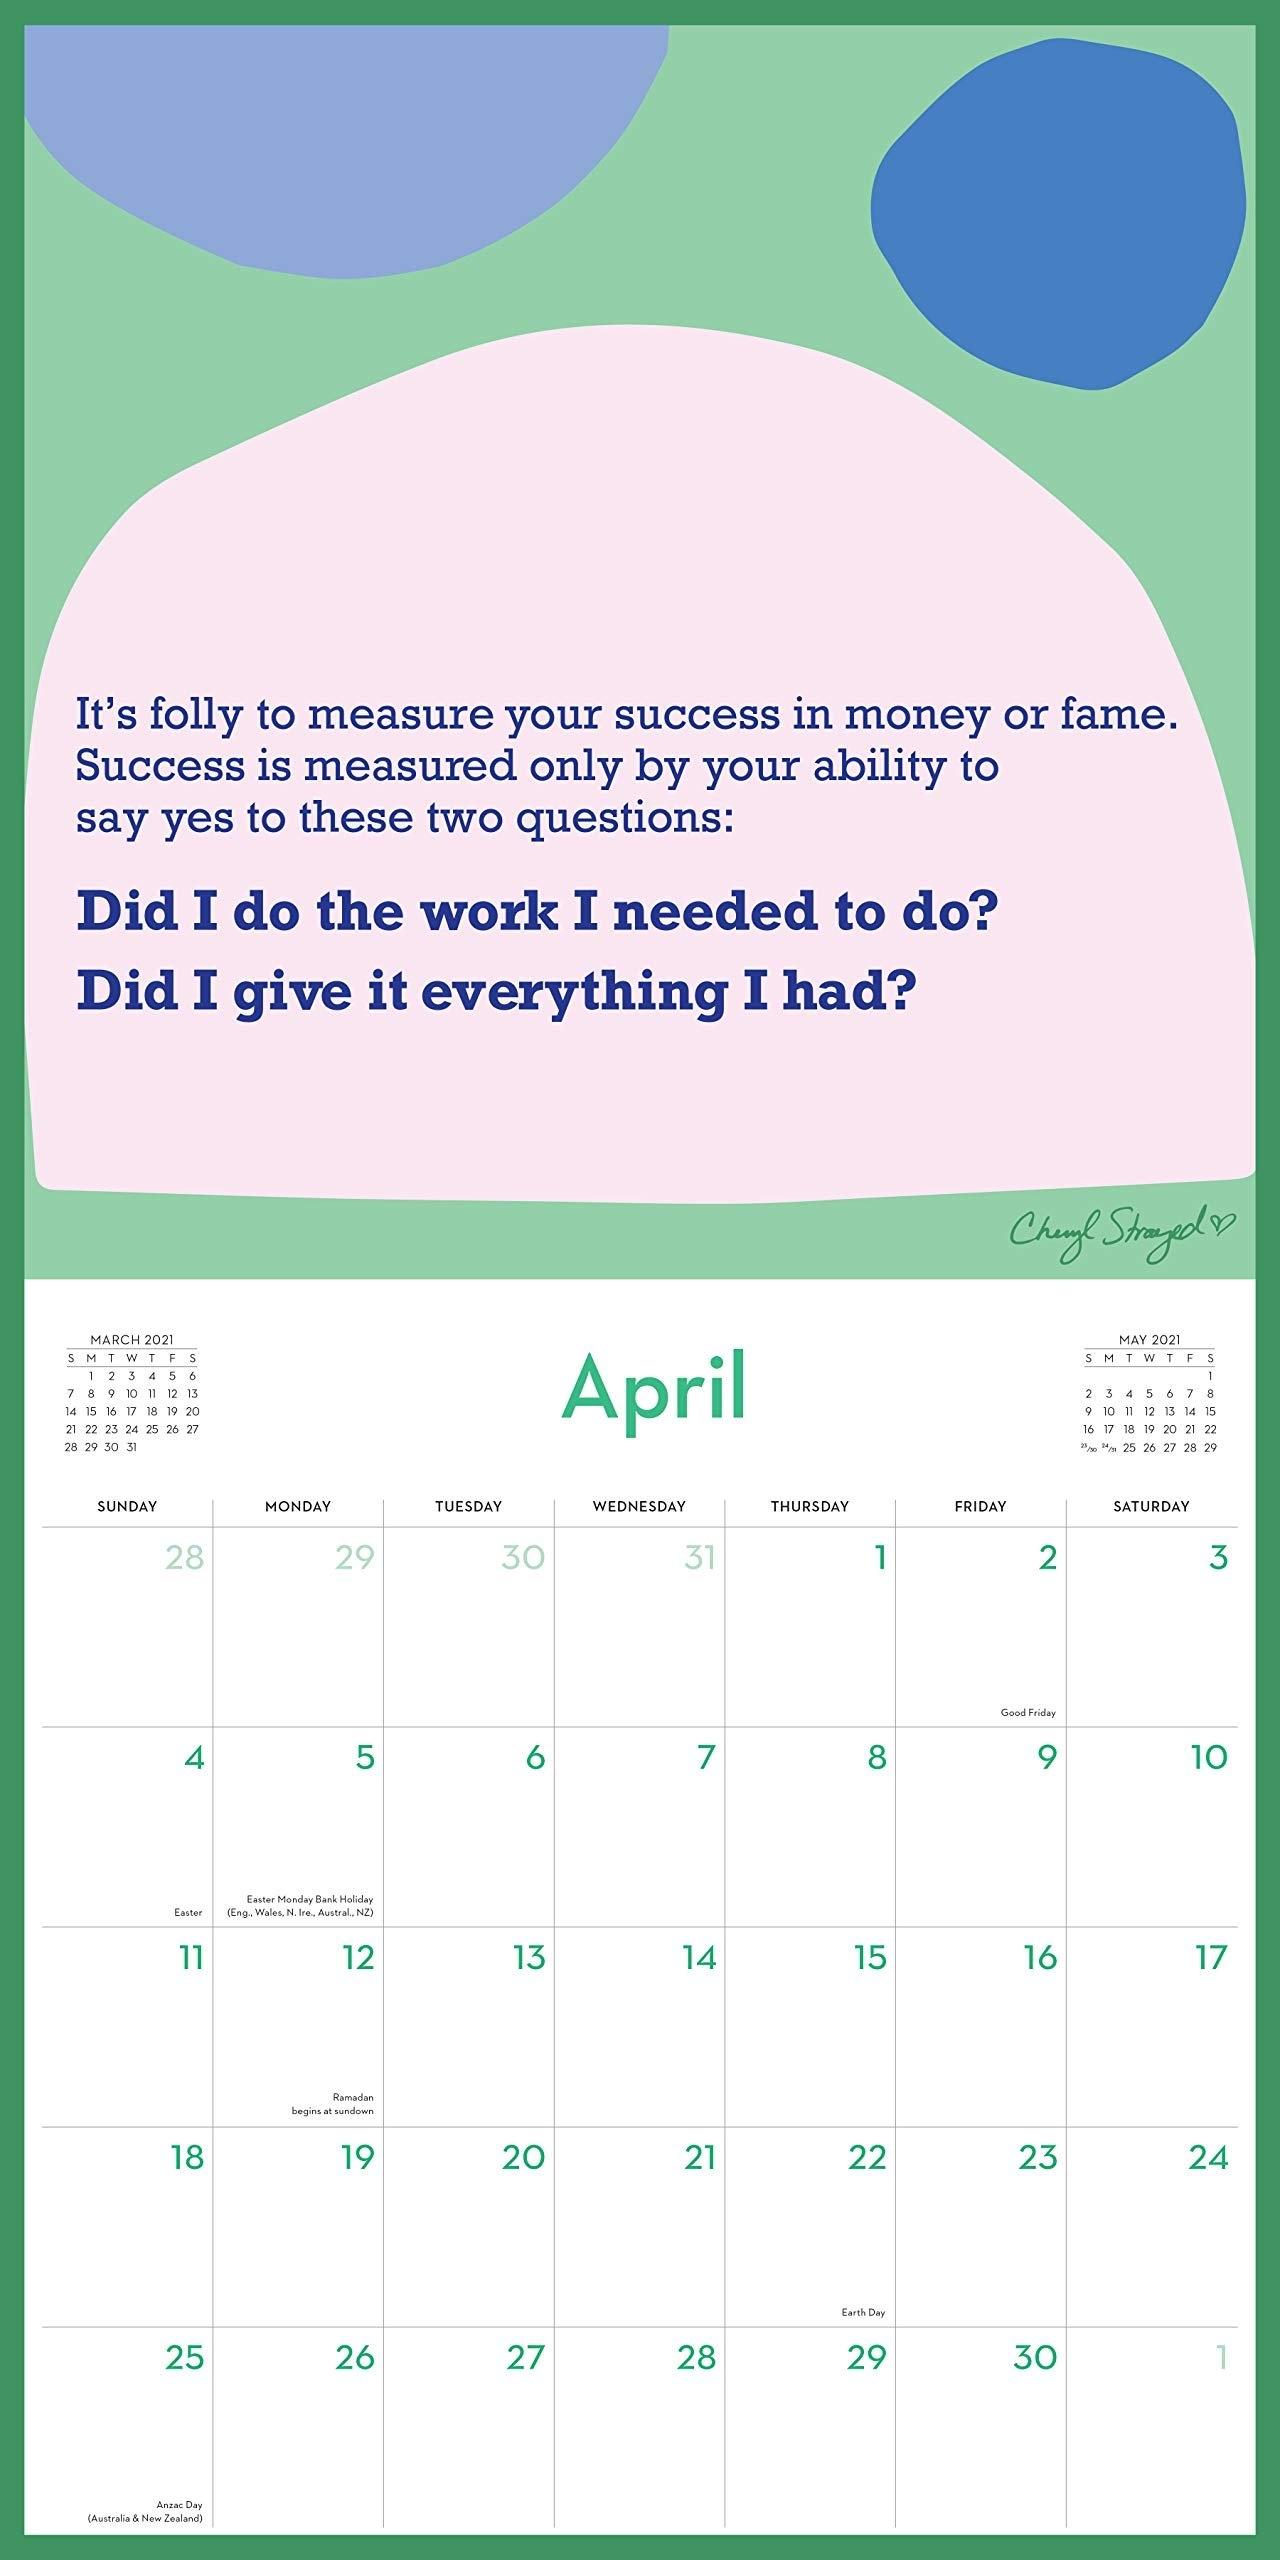 Calendar 2021 - You Get To Make Your Life - Workman Publishing pertaining to Calendar Zile Lucratoare 2021 Upromania Graphics